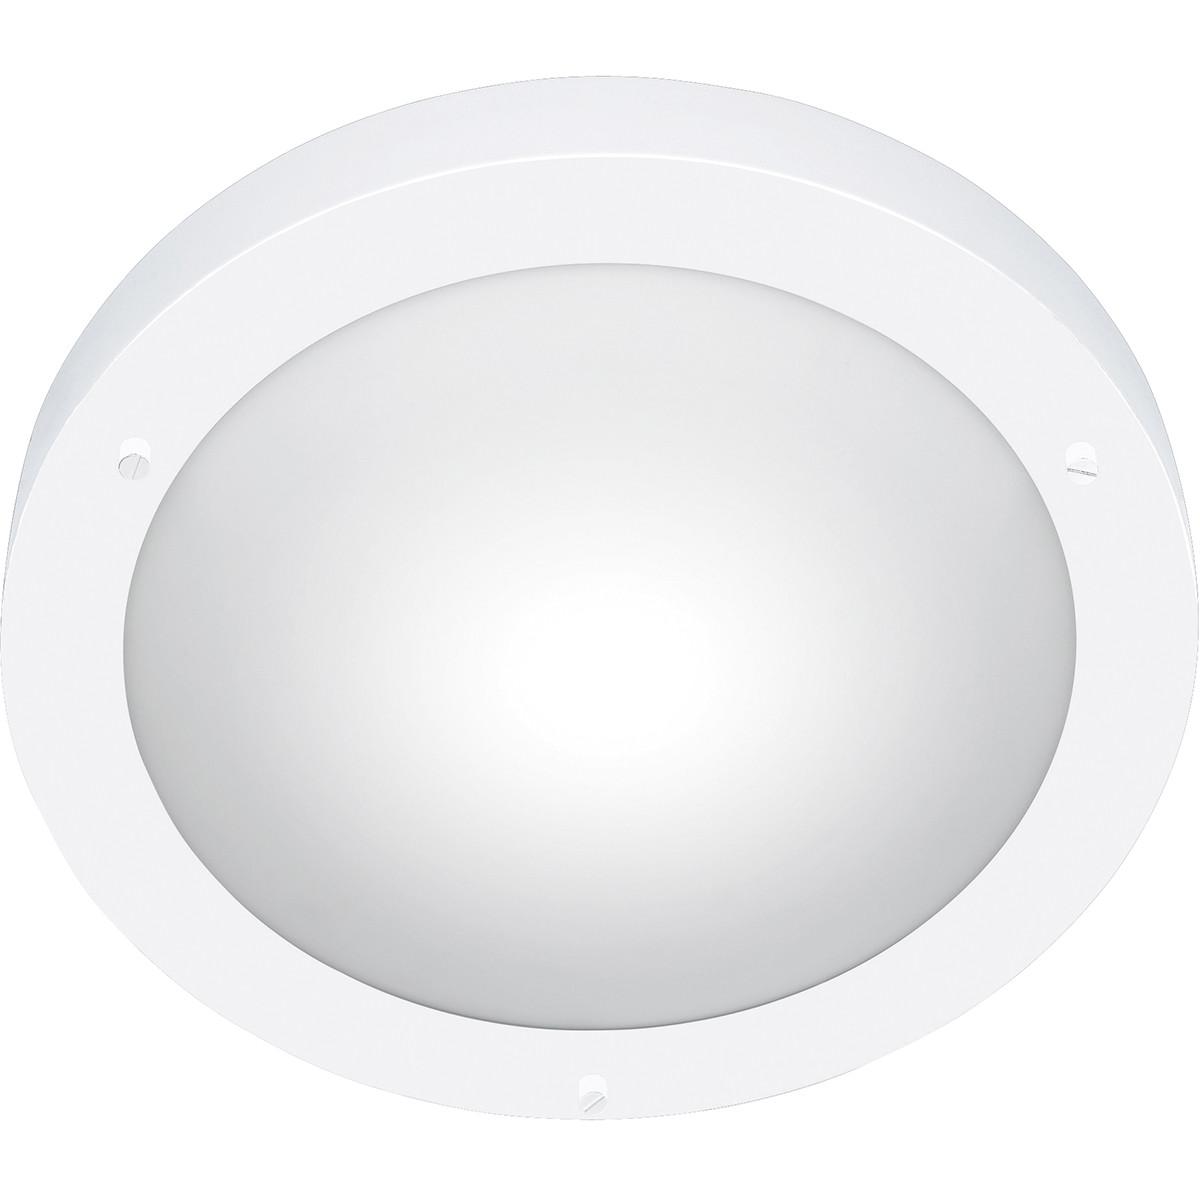 LED Plafondlamp - Trion Condi - Opbouw Rond - Spatwaterdicht IP44 - E27 Fitting - Mat Wit Aluminium